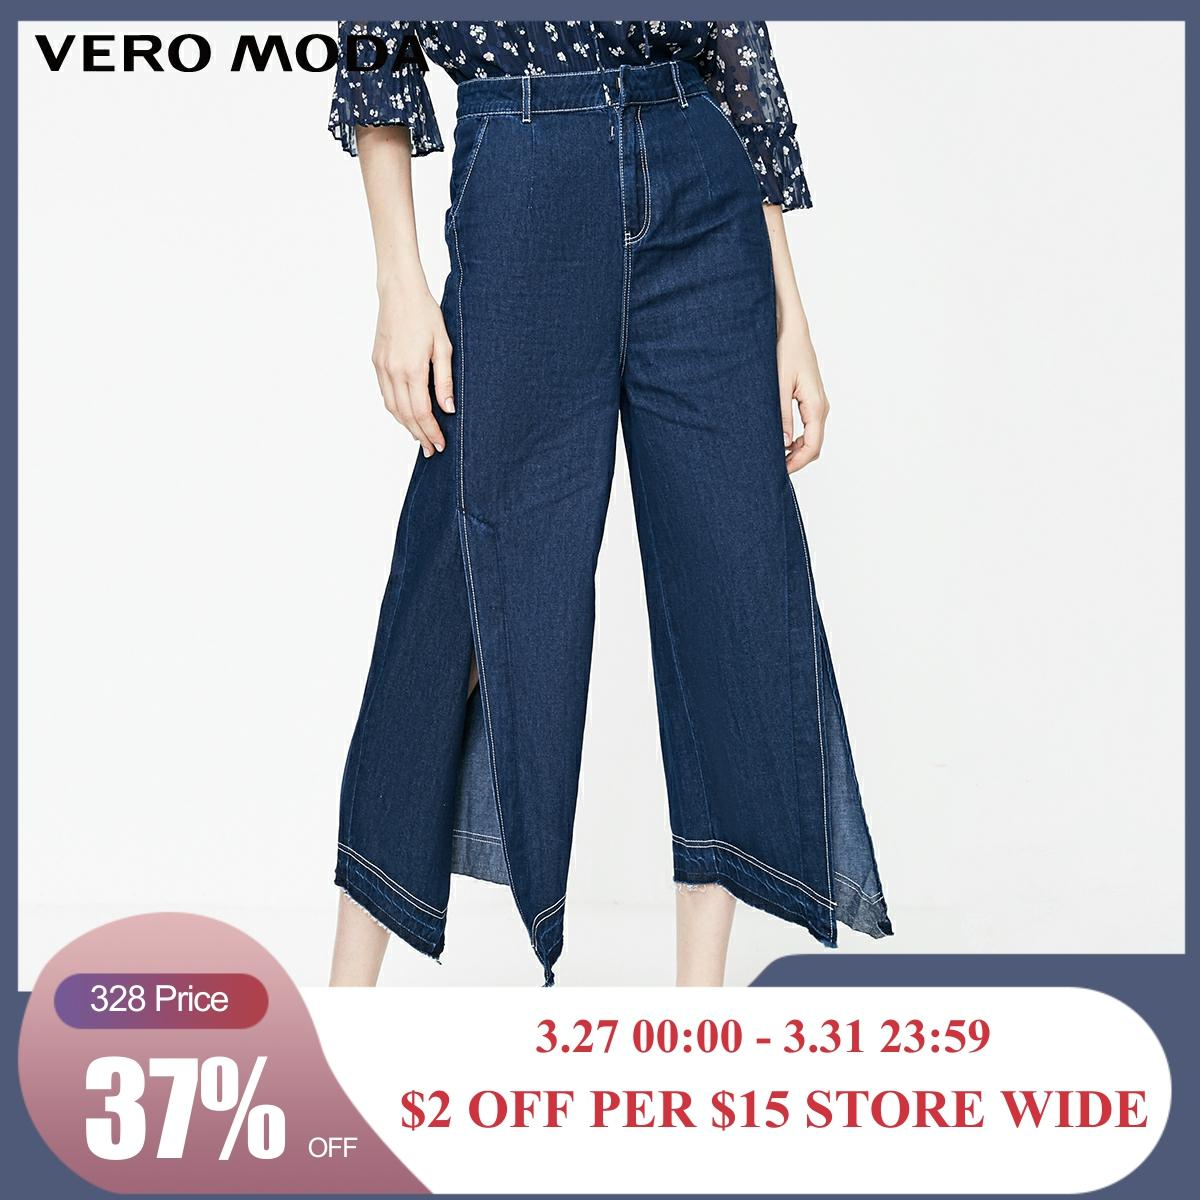 Vero Moda Women's Raw-edge Cuffs Visible Stitches High-rise Capri Jeans   31926I518